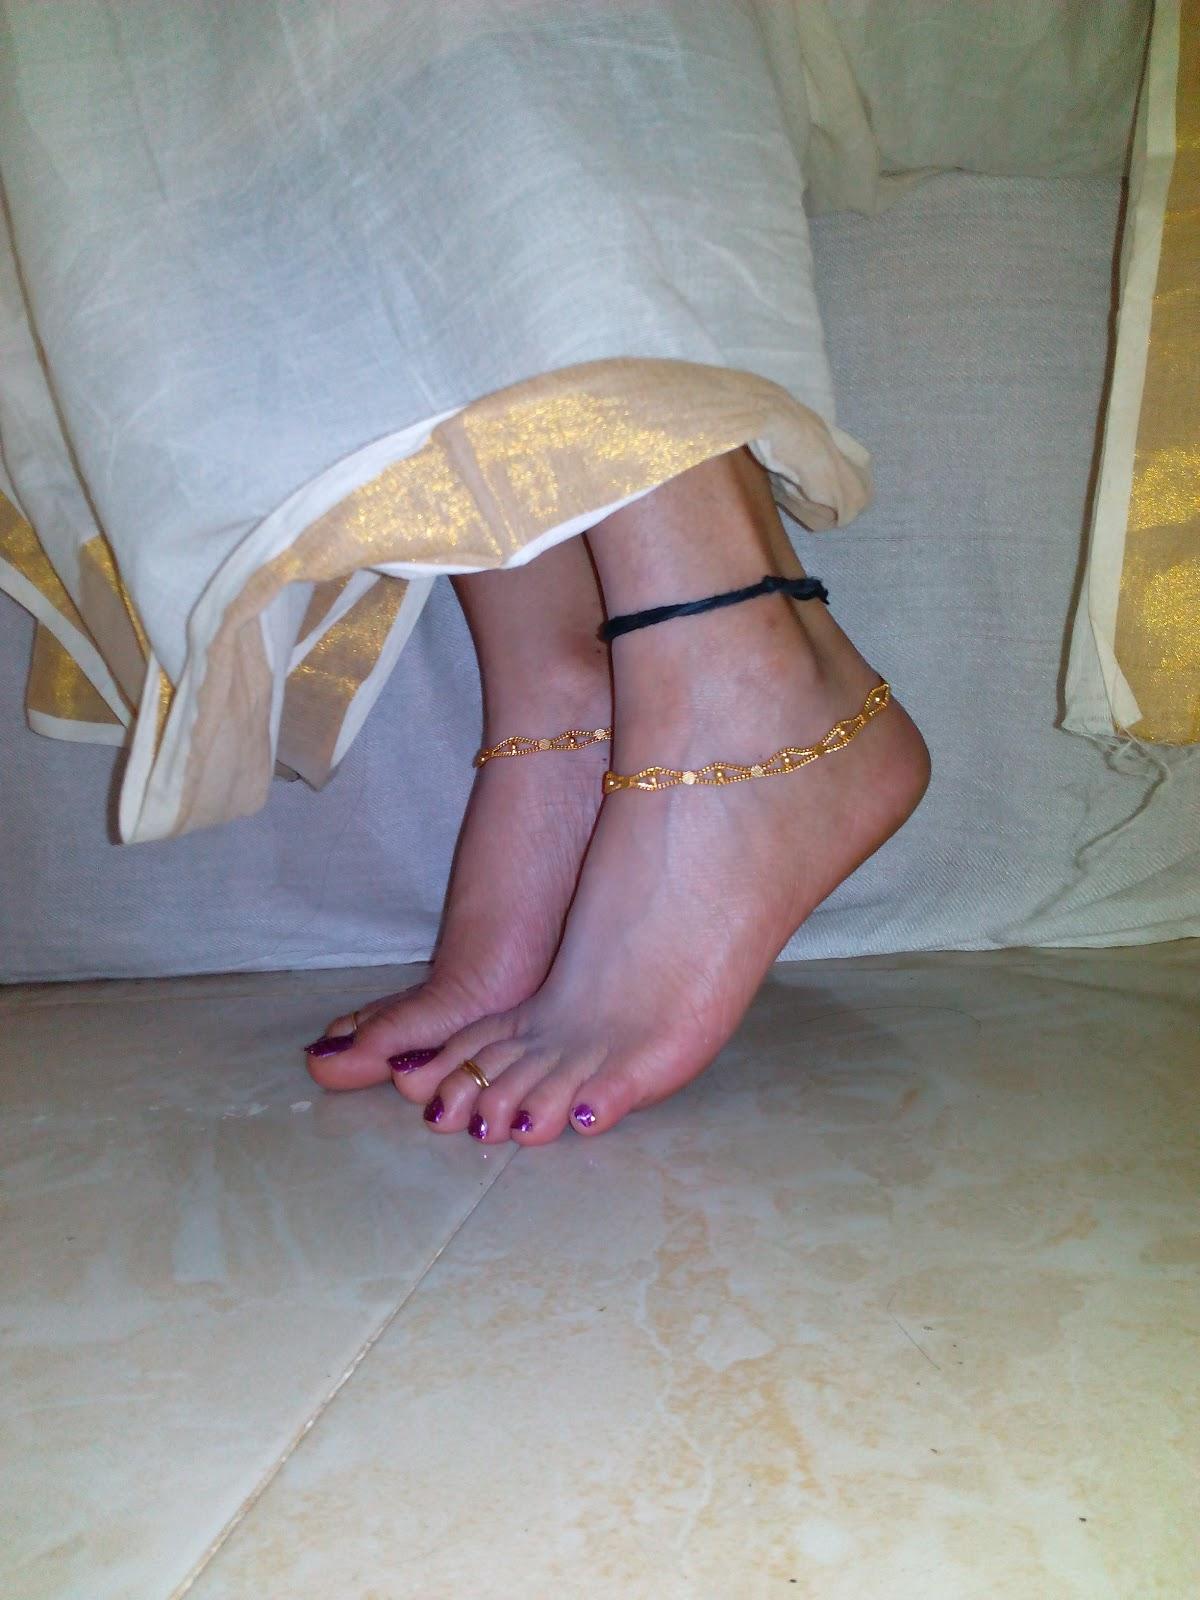 Desi Indian Feet amp Anklets  YouTube